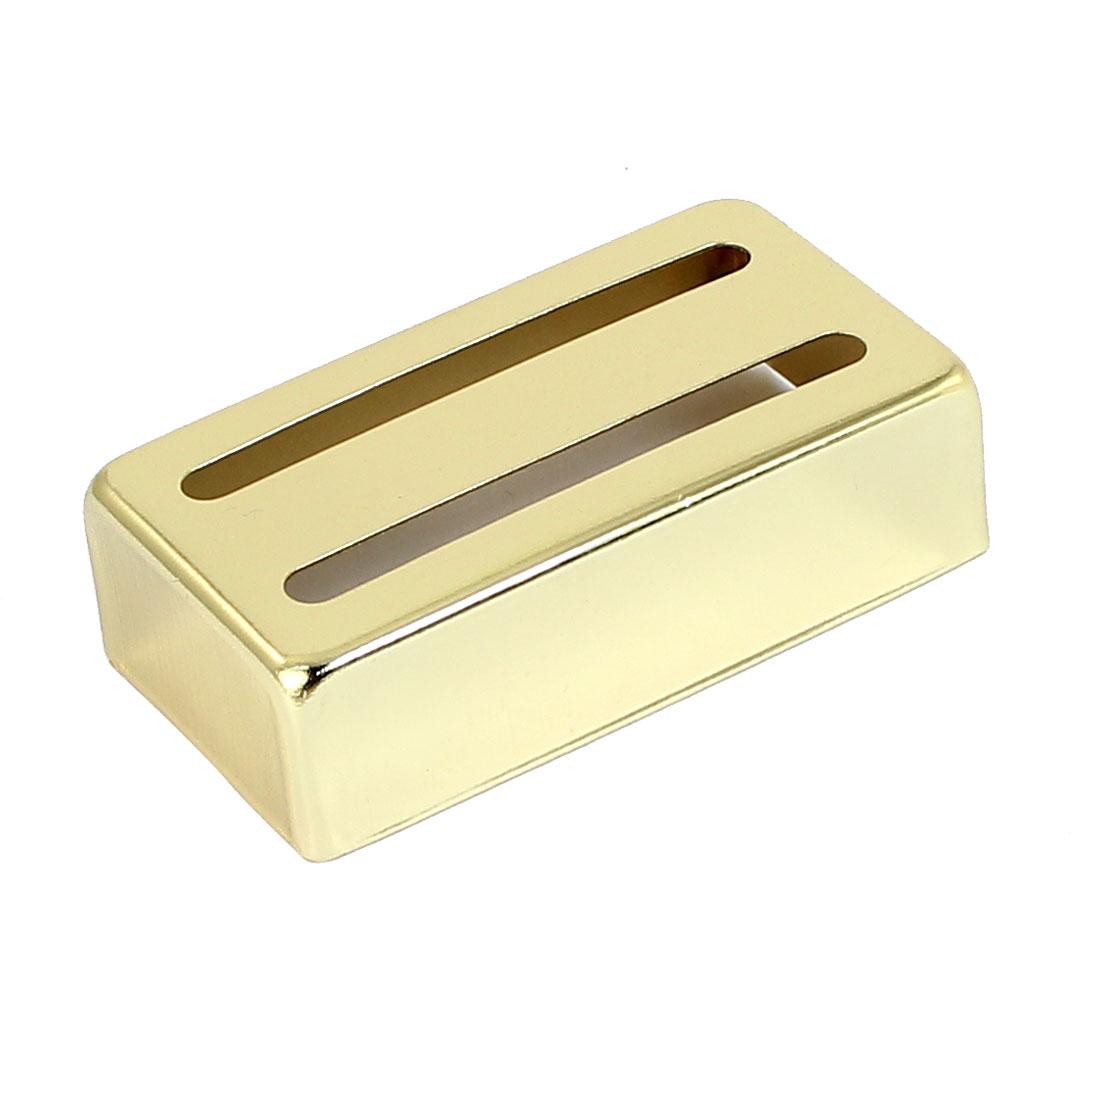 Acoustic Electric Guitar Humbucker Pickup 7cm x 4cm x 2cm Metal Cover Gold Tone